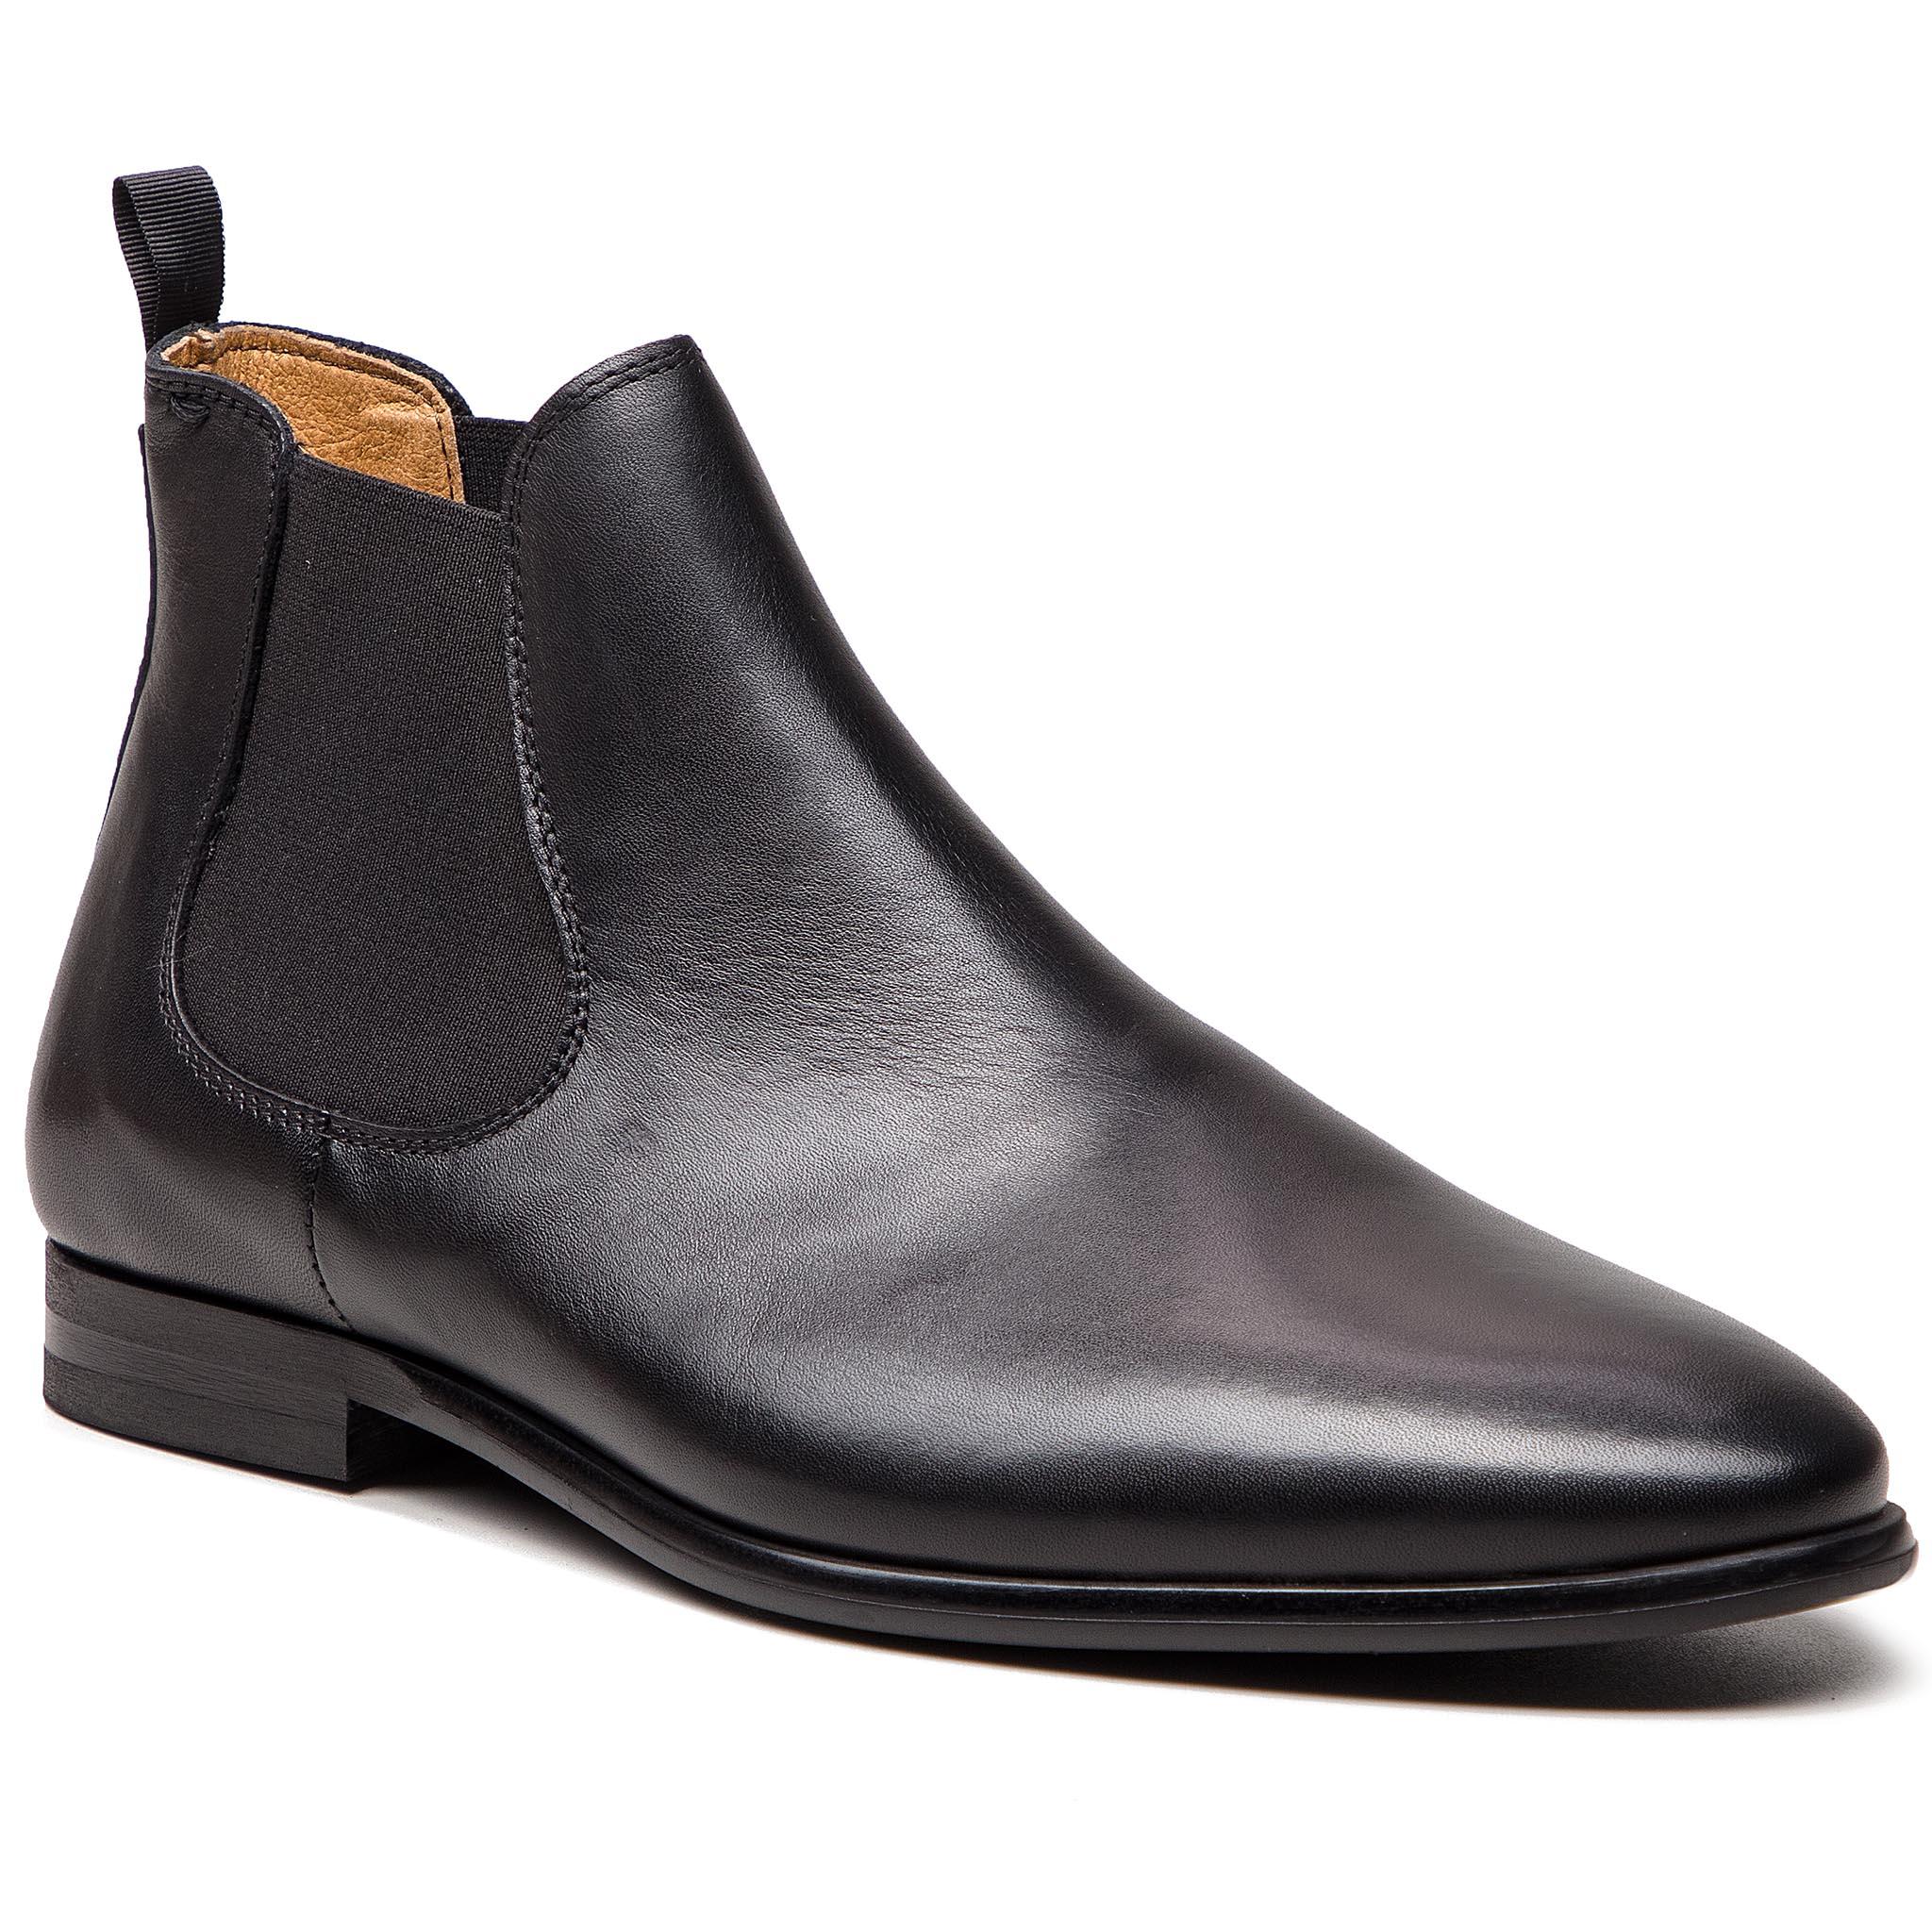 Kotníková obuv s elastickým prvkom ALDO - Wadda 56996636 97 - Glami.sk fd65db3362